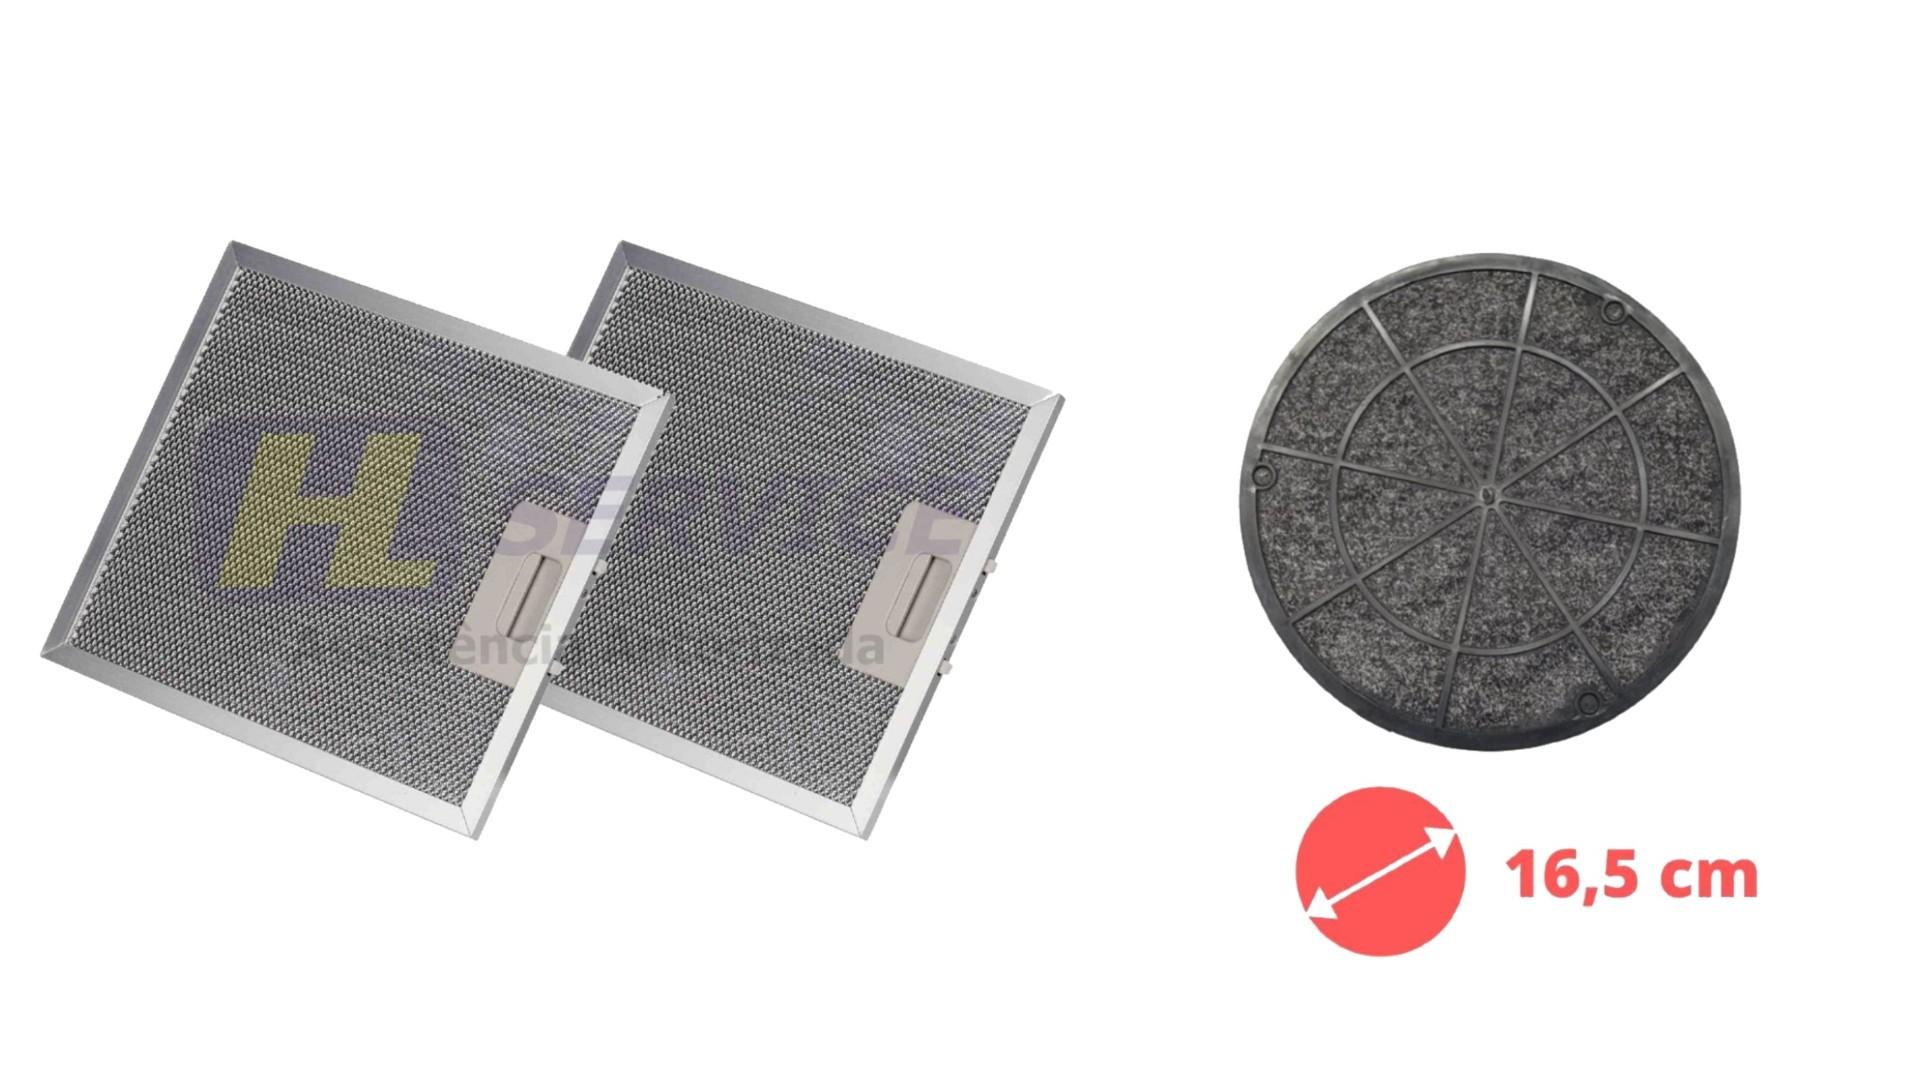 Kit 02 Filtros Tela + Filtro Carvão Depurador SLIM SUGGAR 27,8 x 31,6 cm